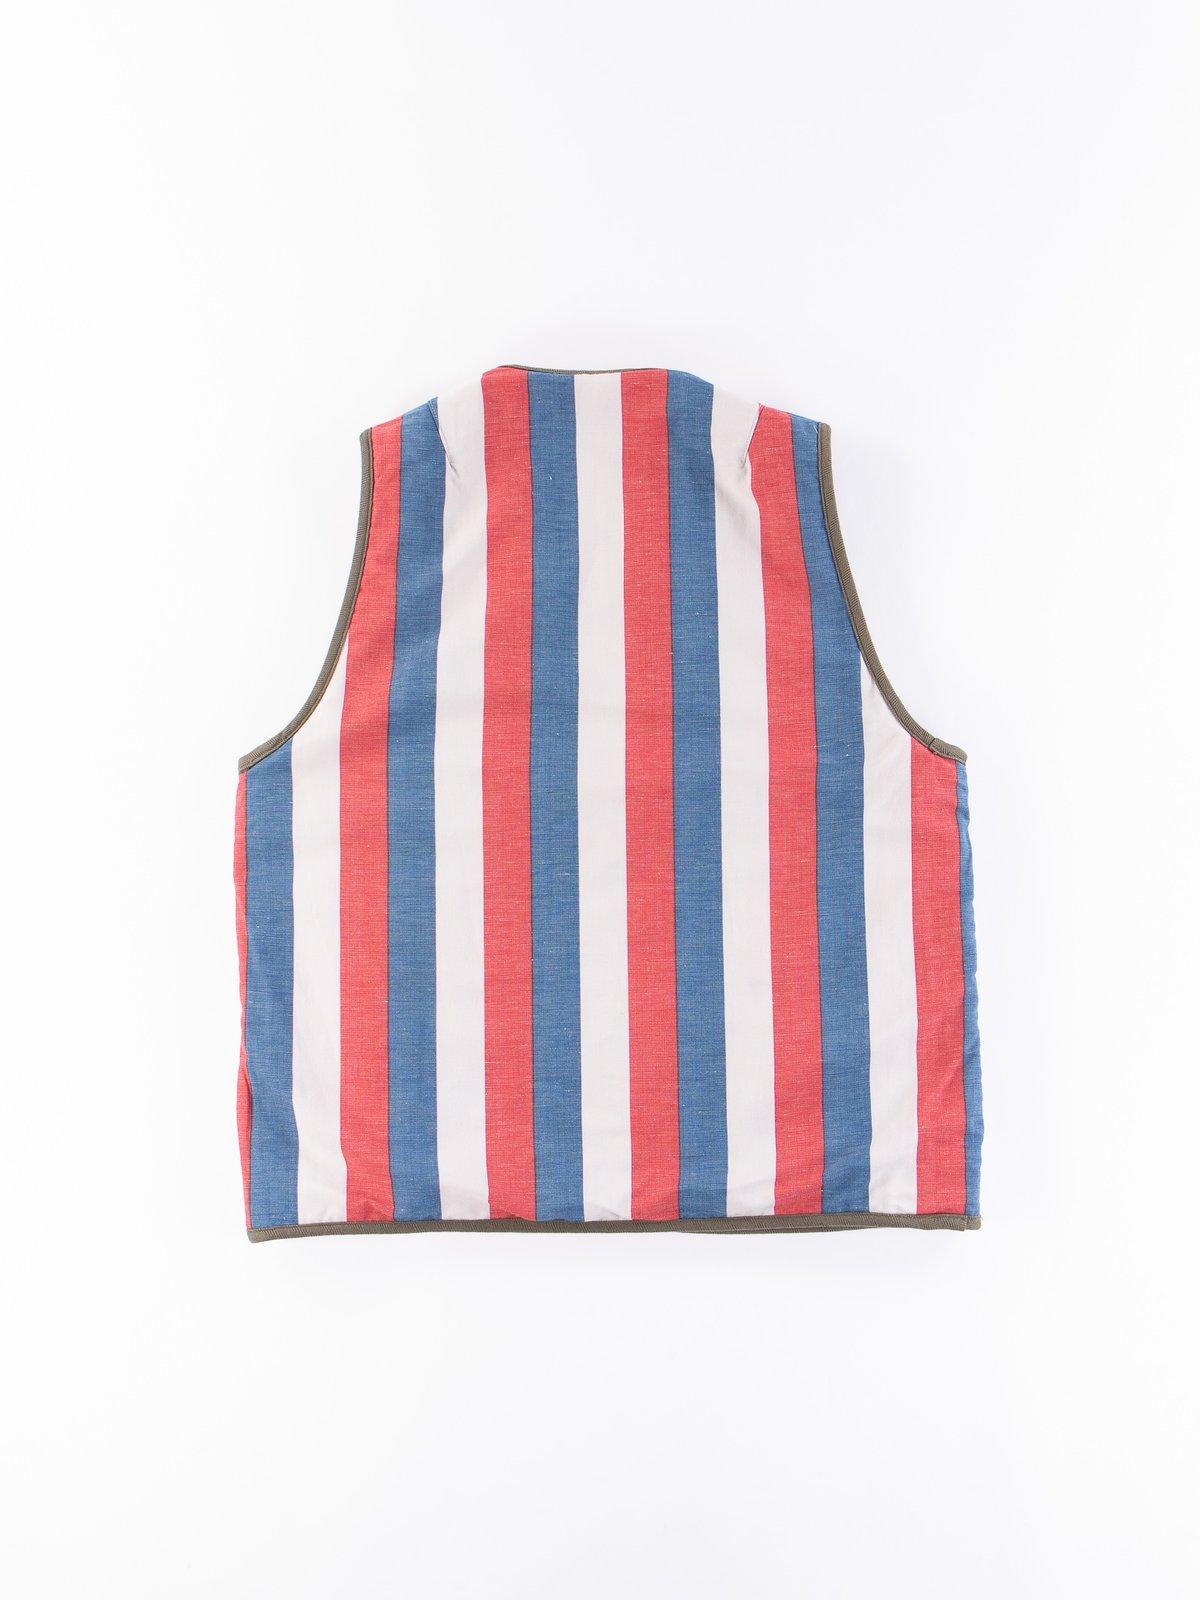 Olive Iris Cotton Liner Vest - Image 11